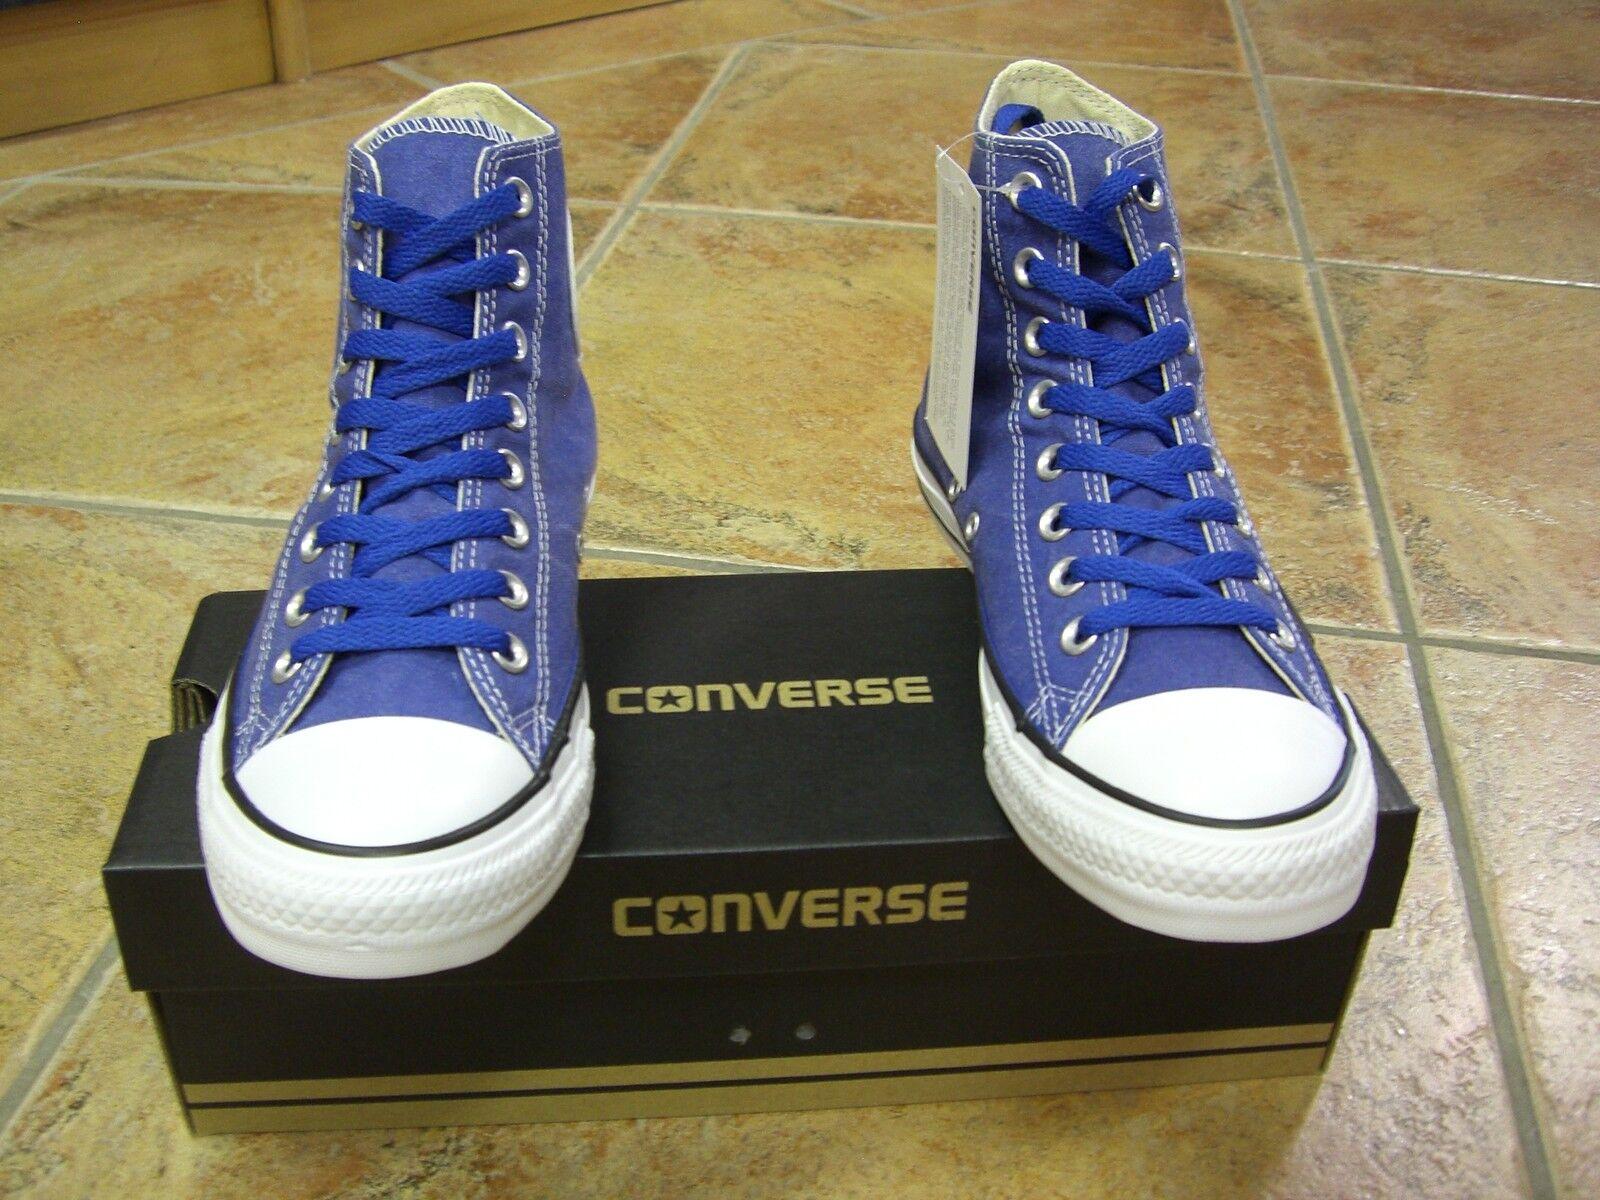 Converse Chucks All Star Gr. 38 HI DEEP ULTRAMA 136845C  NEU Top aktuell